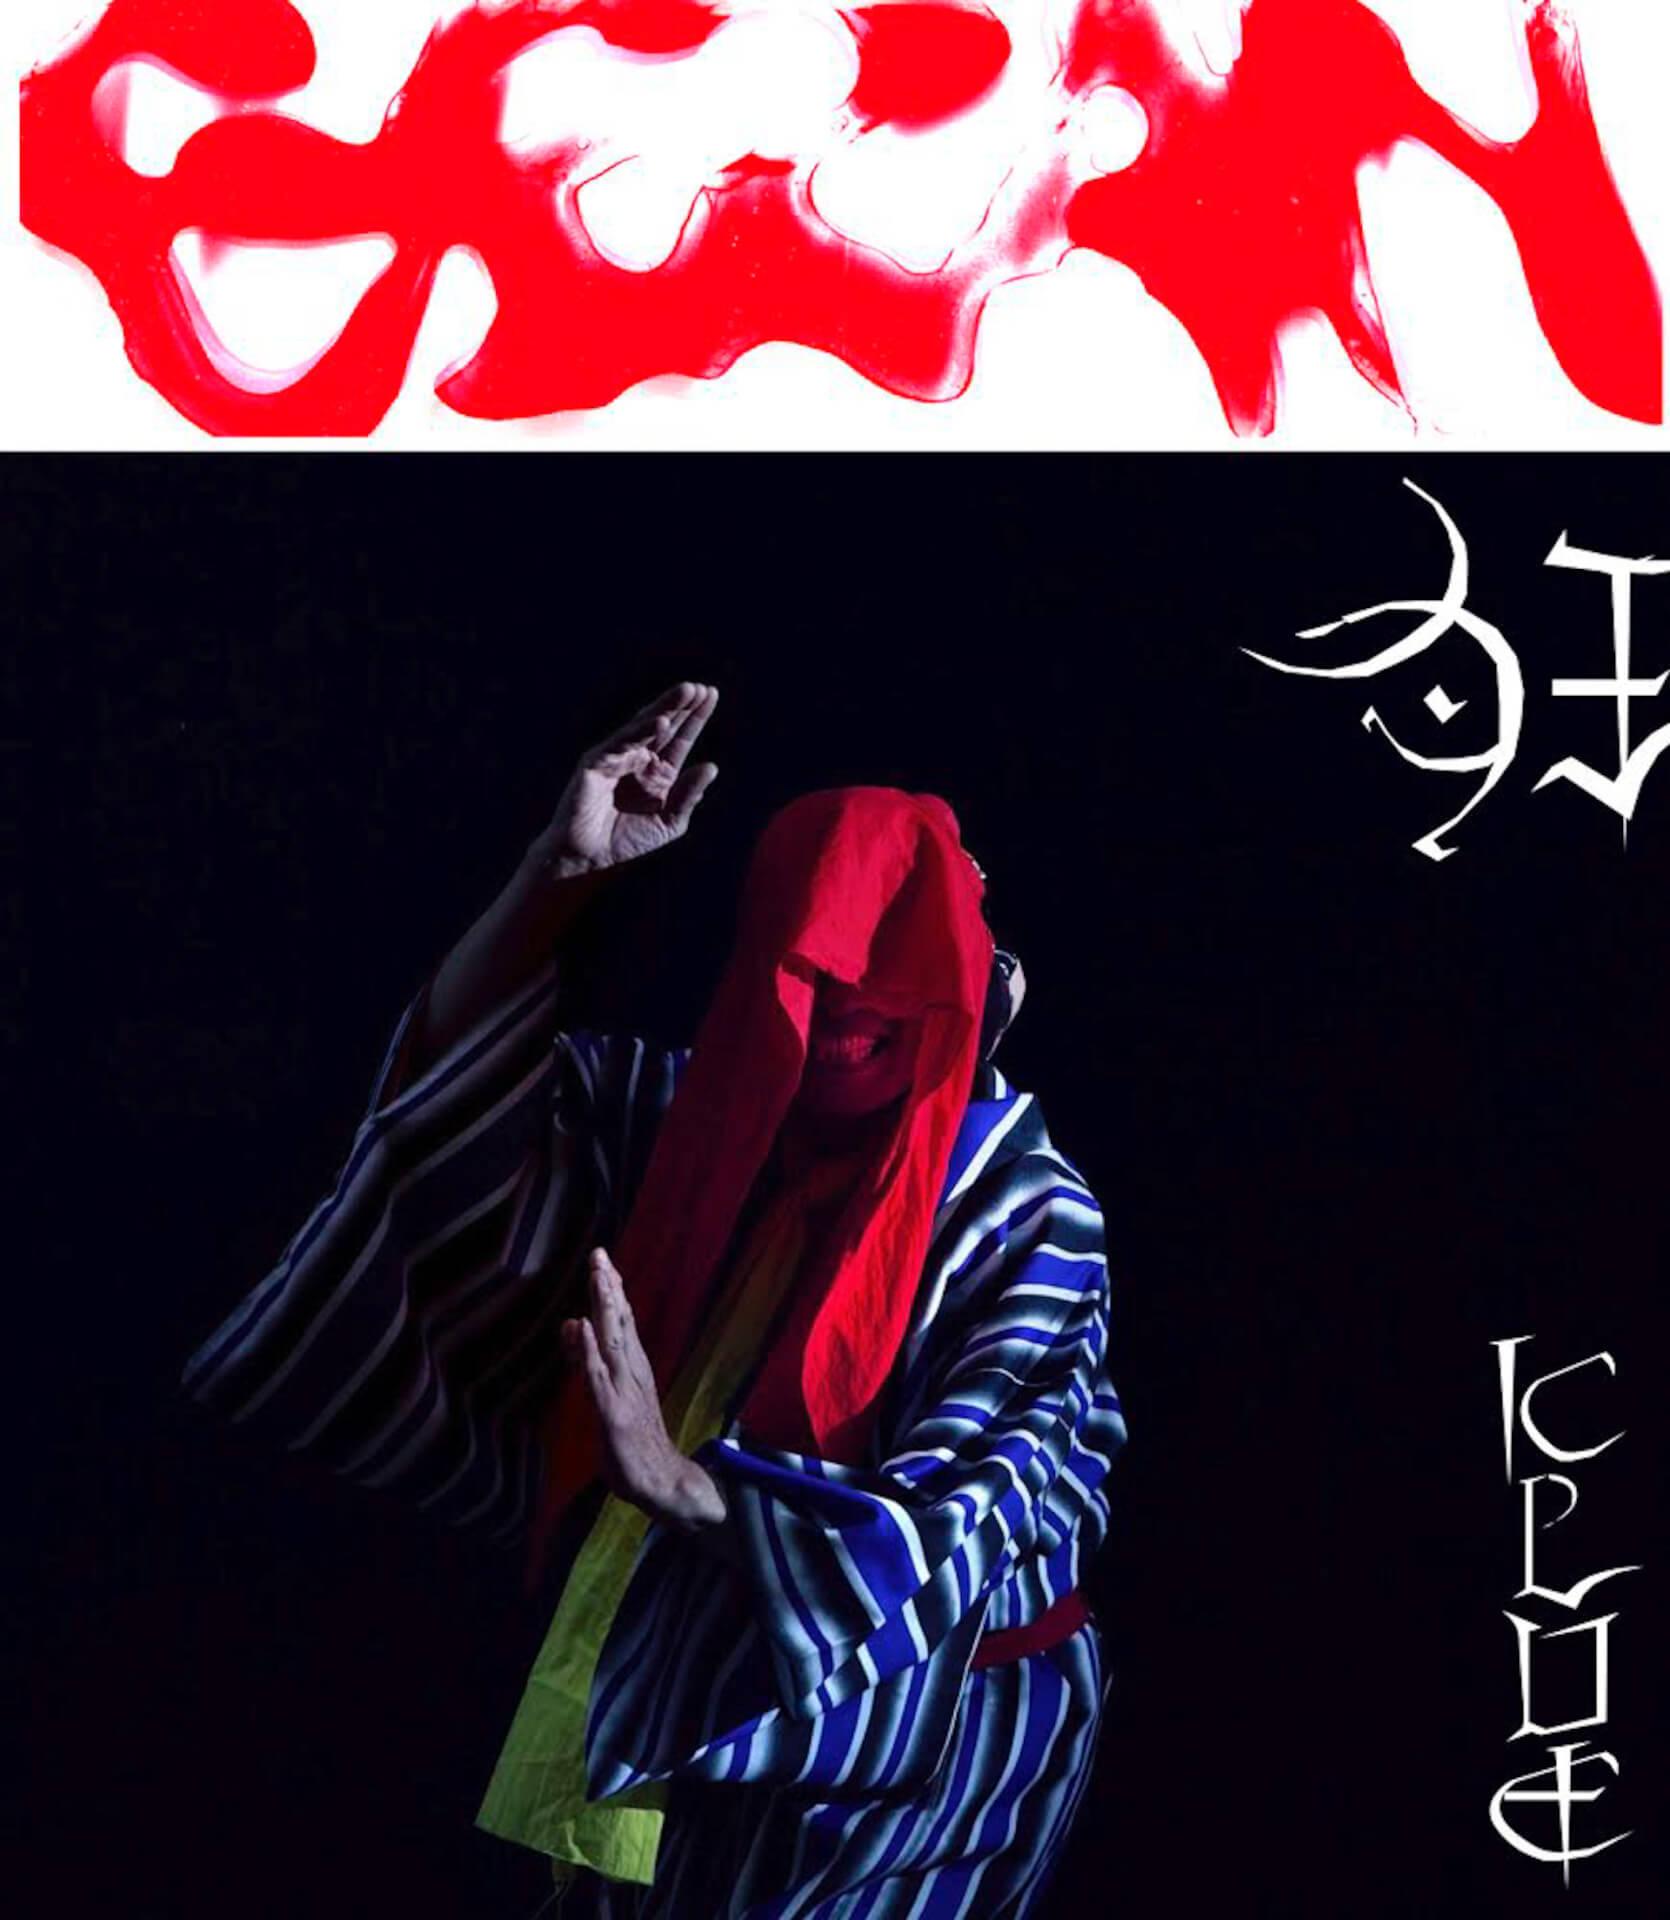 GEZAN、5th ALBUM『狂(KLUE)』を自主レーベル十三月よりリリース|東名阪を周遊するリリースツアーも開催 music191126_gezan_main